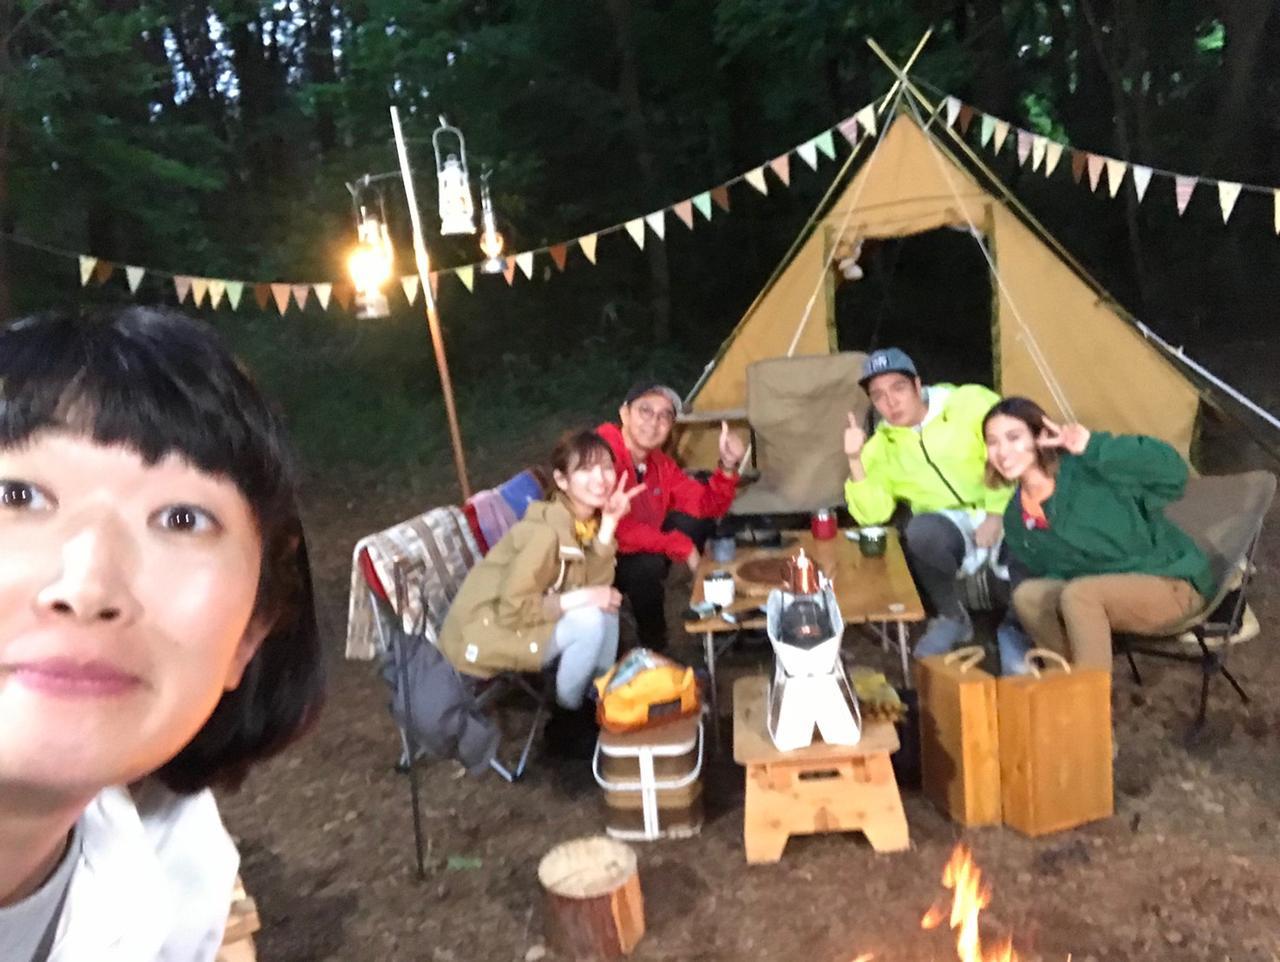 Images : 4番目の画像 - おぎやはぎのハピキャン「映えキャンプ」写真集 - ハピキャン|キャンプ・アウトドア情報メディア